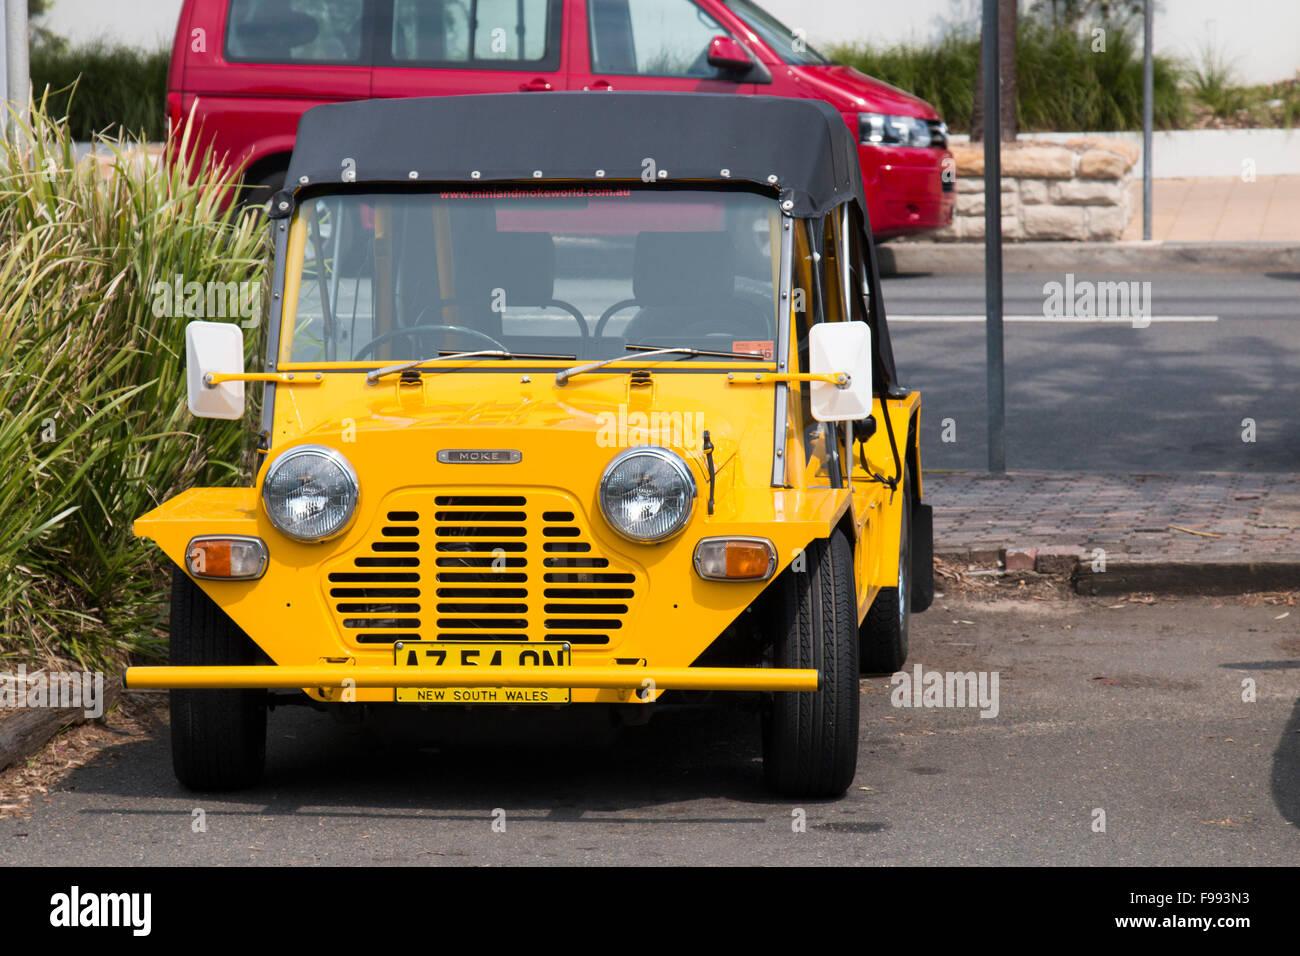 yellow Mini Moke motor car vehicle parked in North Sydney,Australia - Stock Image